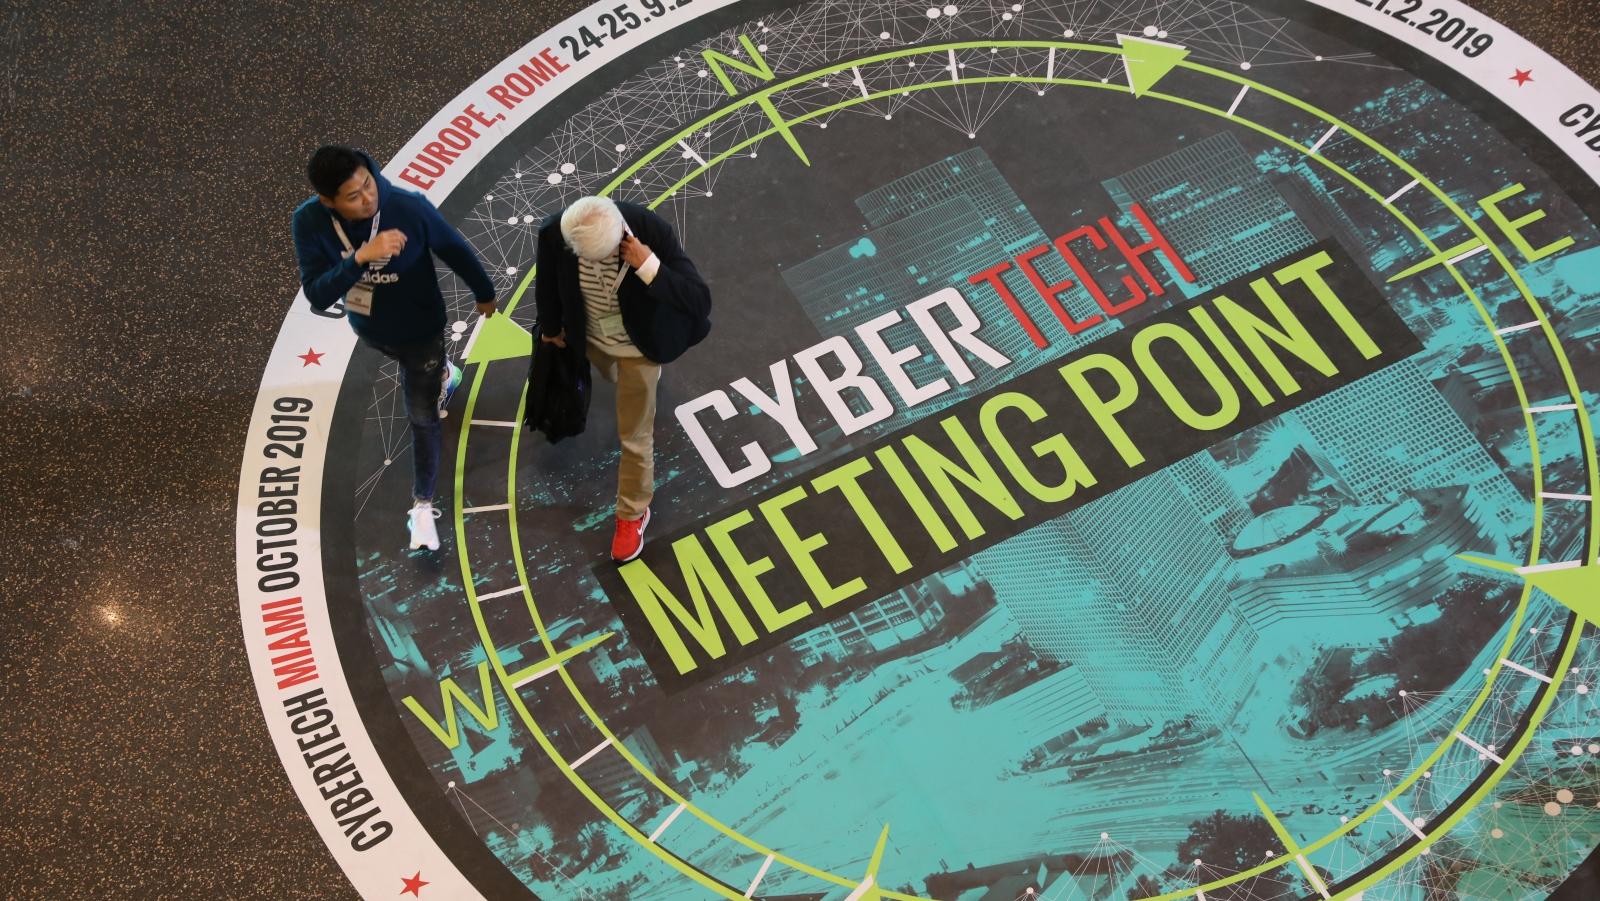 Israeli cybersecurity startups raised $6.32b in 2013-2019 - ISRAEL21c